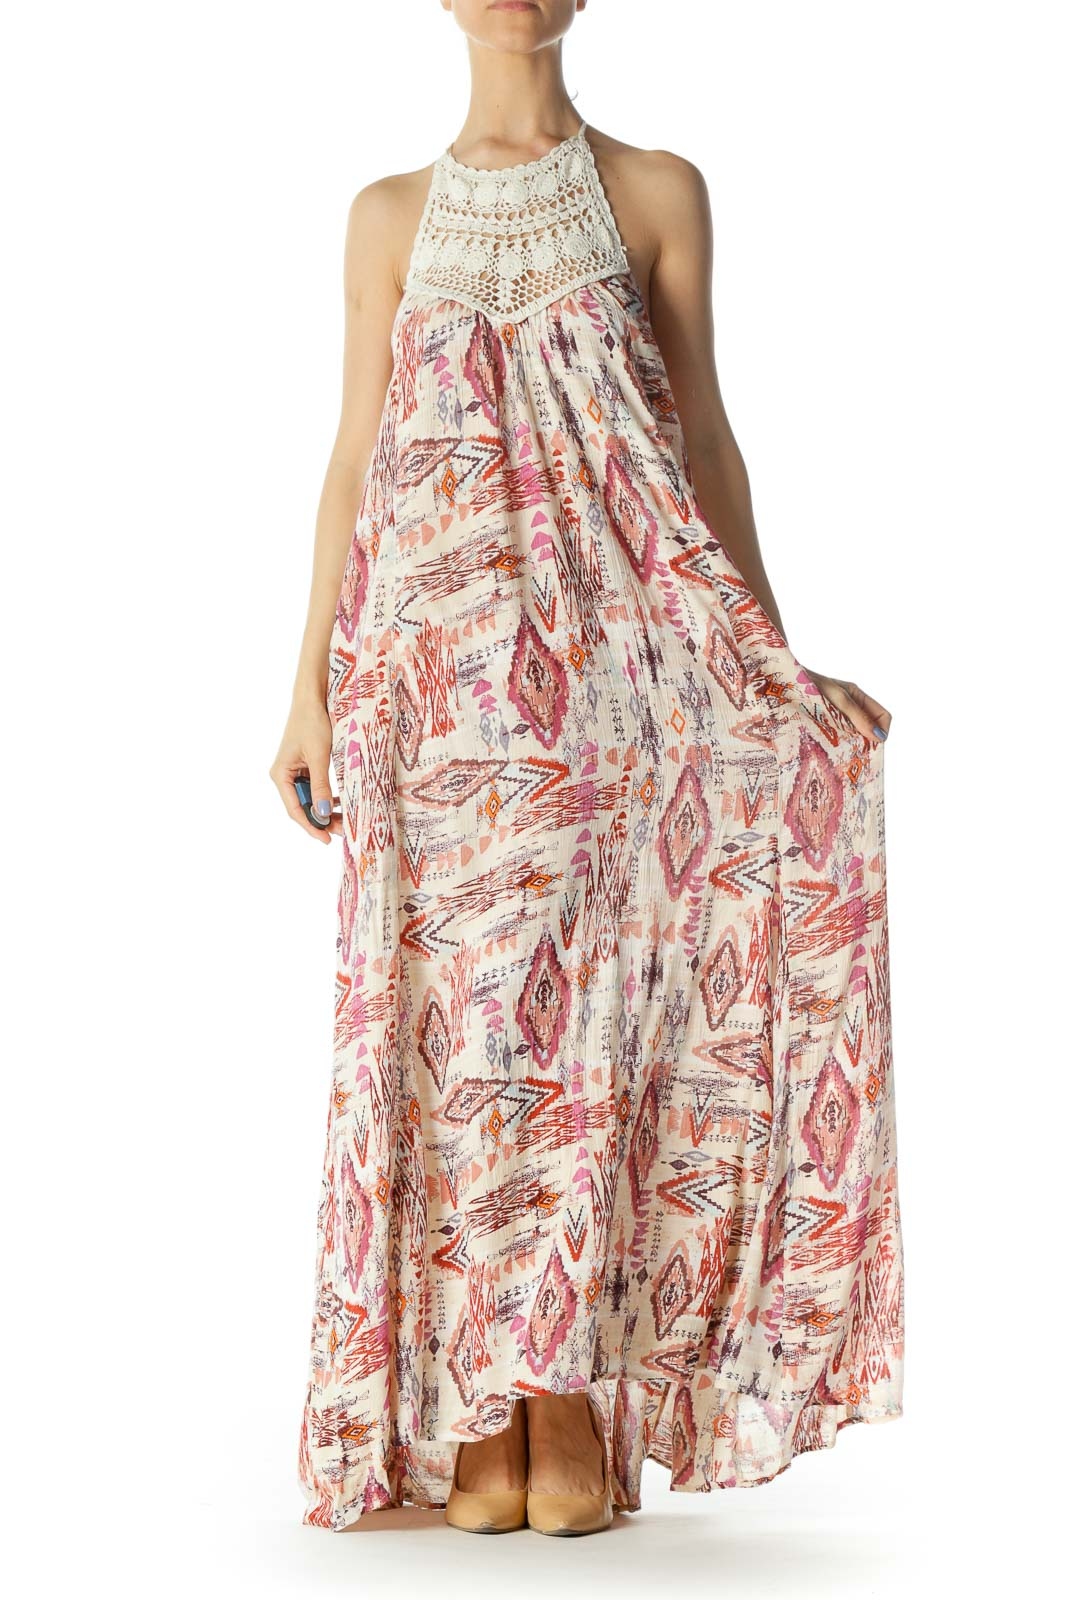 Cream/Red/Pink Printed Crocheted Halter-Neckline Day Dress Front